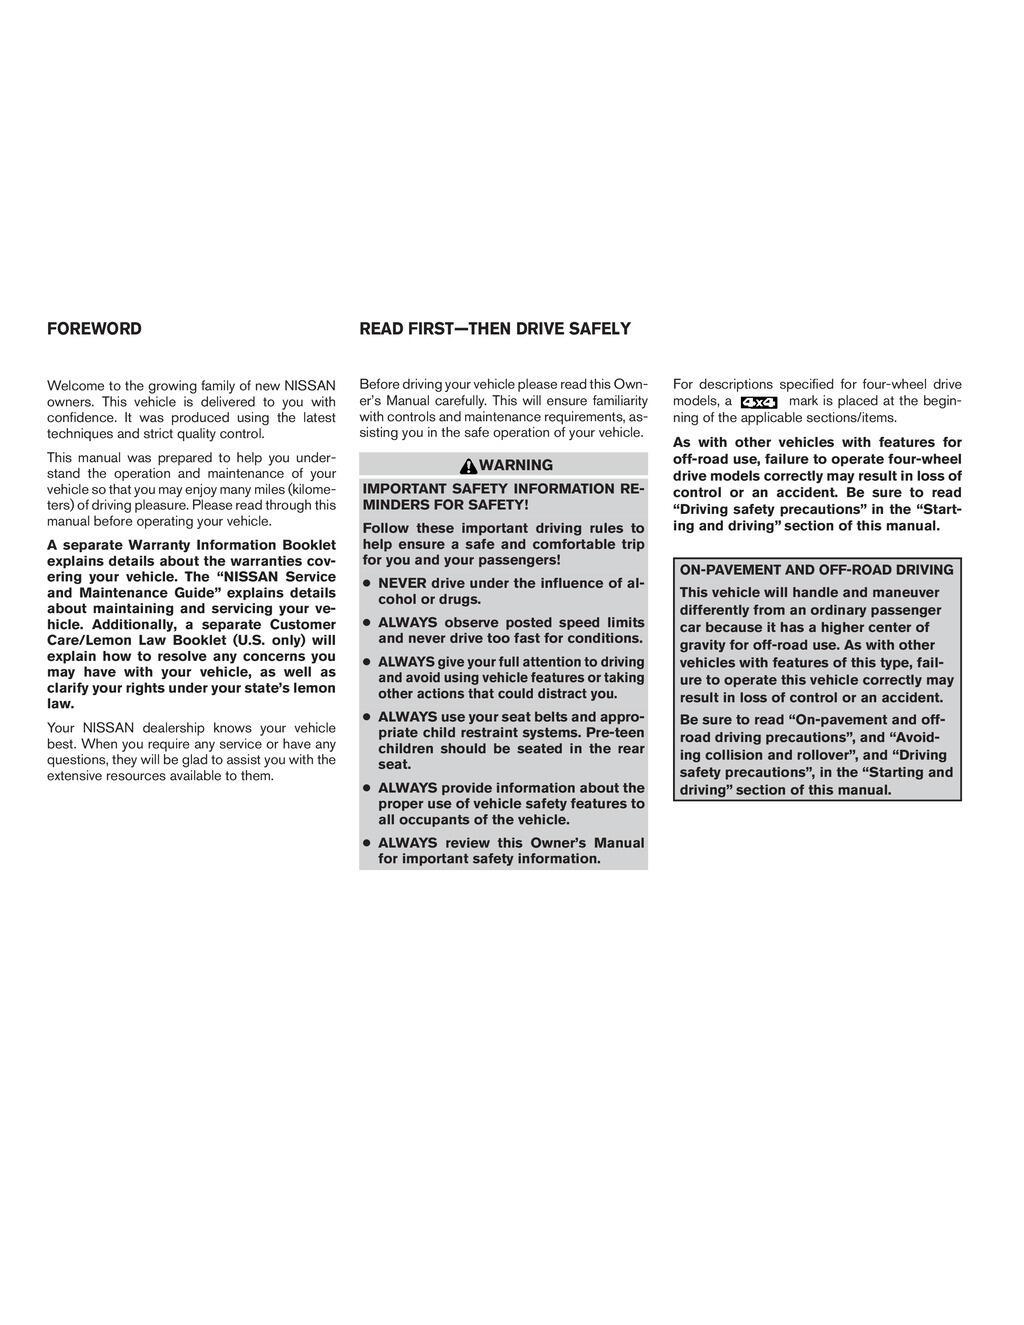 2008 Nissan Titan owners manual